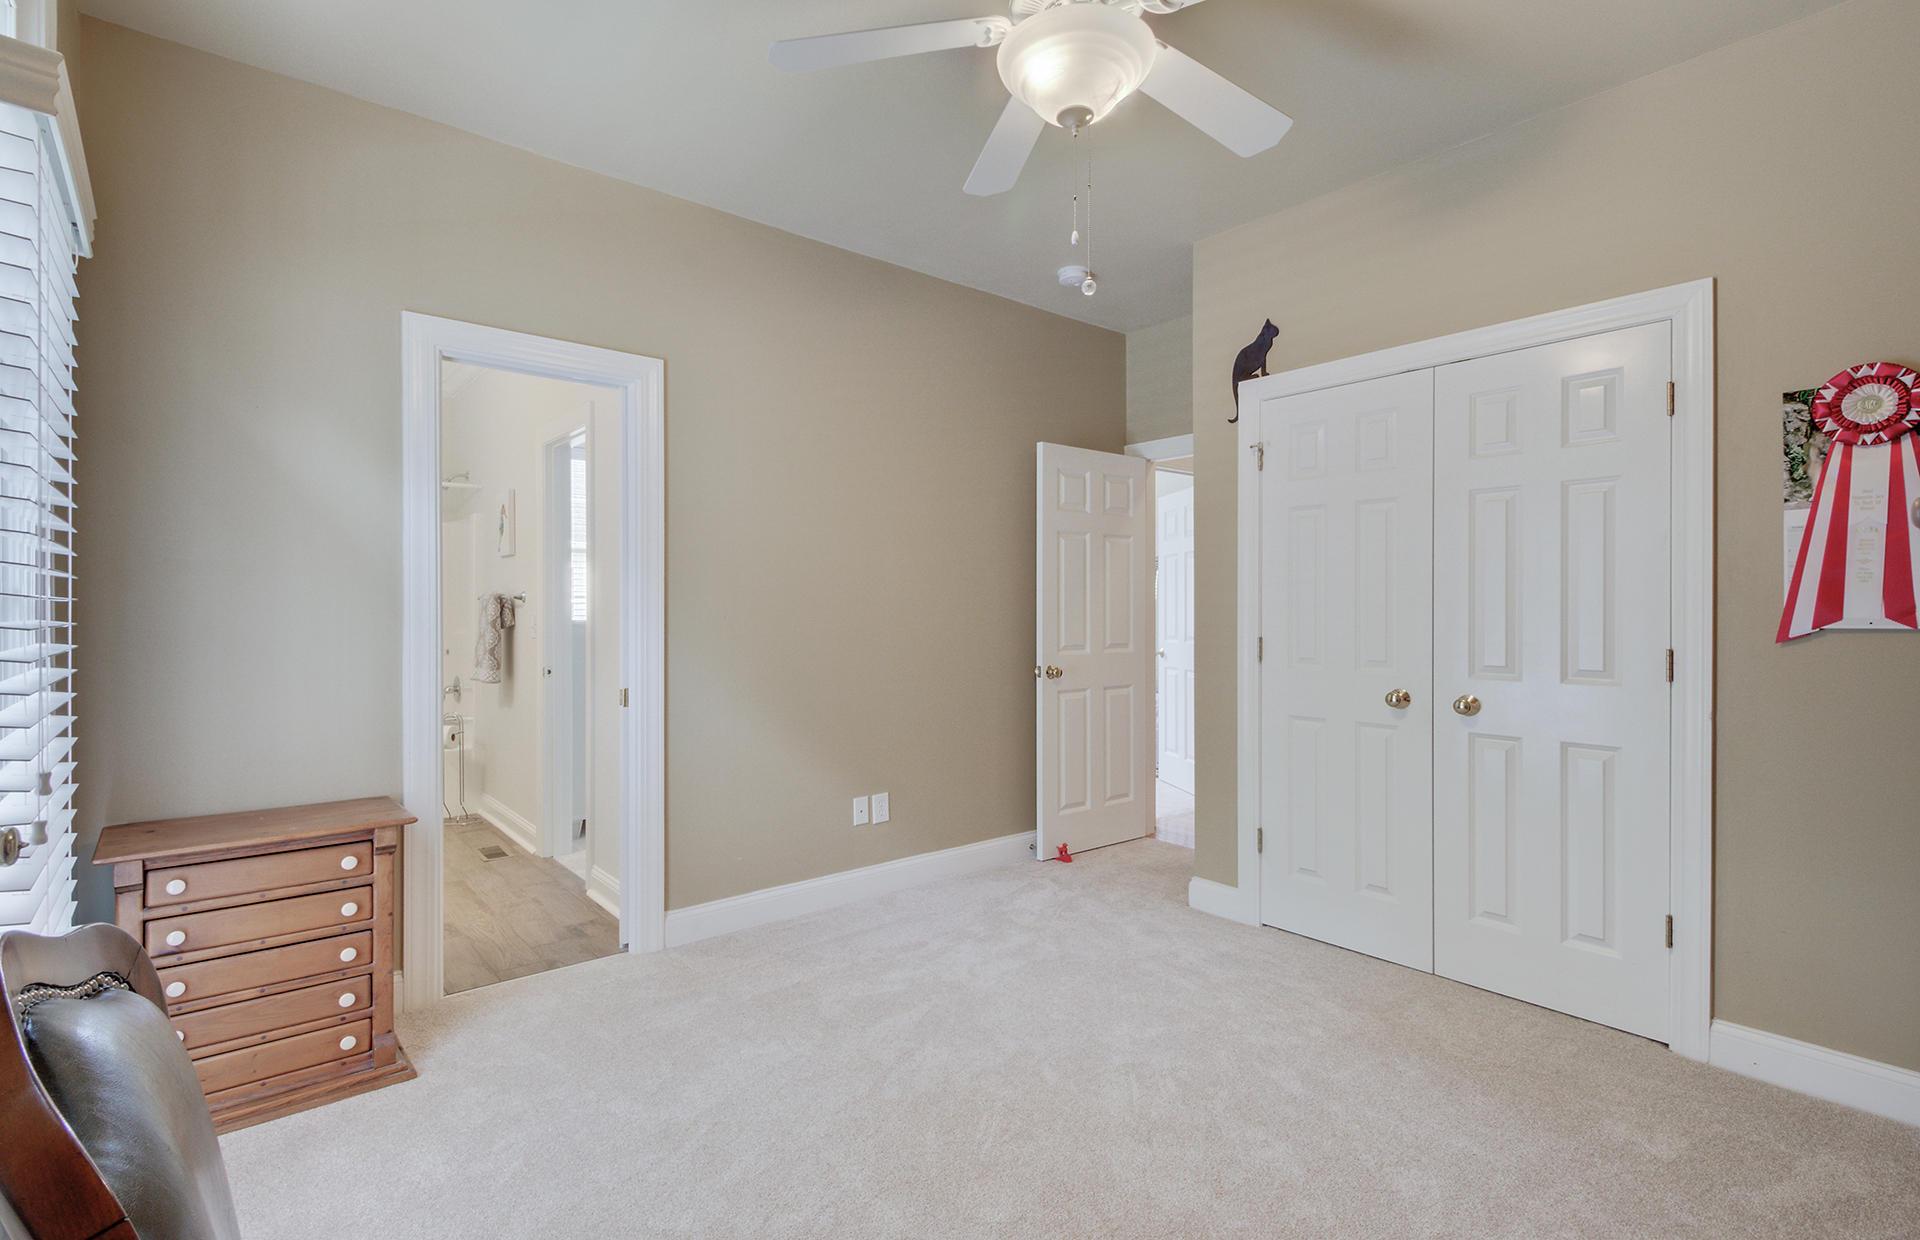 Dunes West Homes For Sale - 2453 Darts Cove, Mount Pleasant, SC - 47